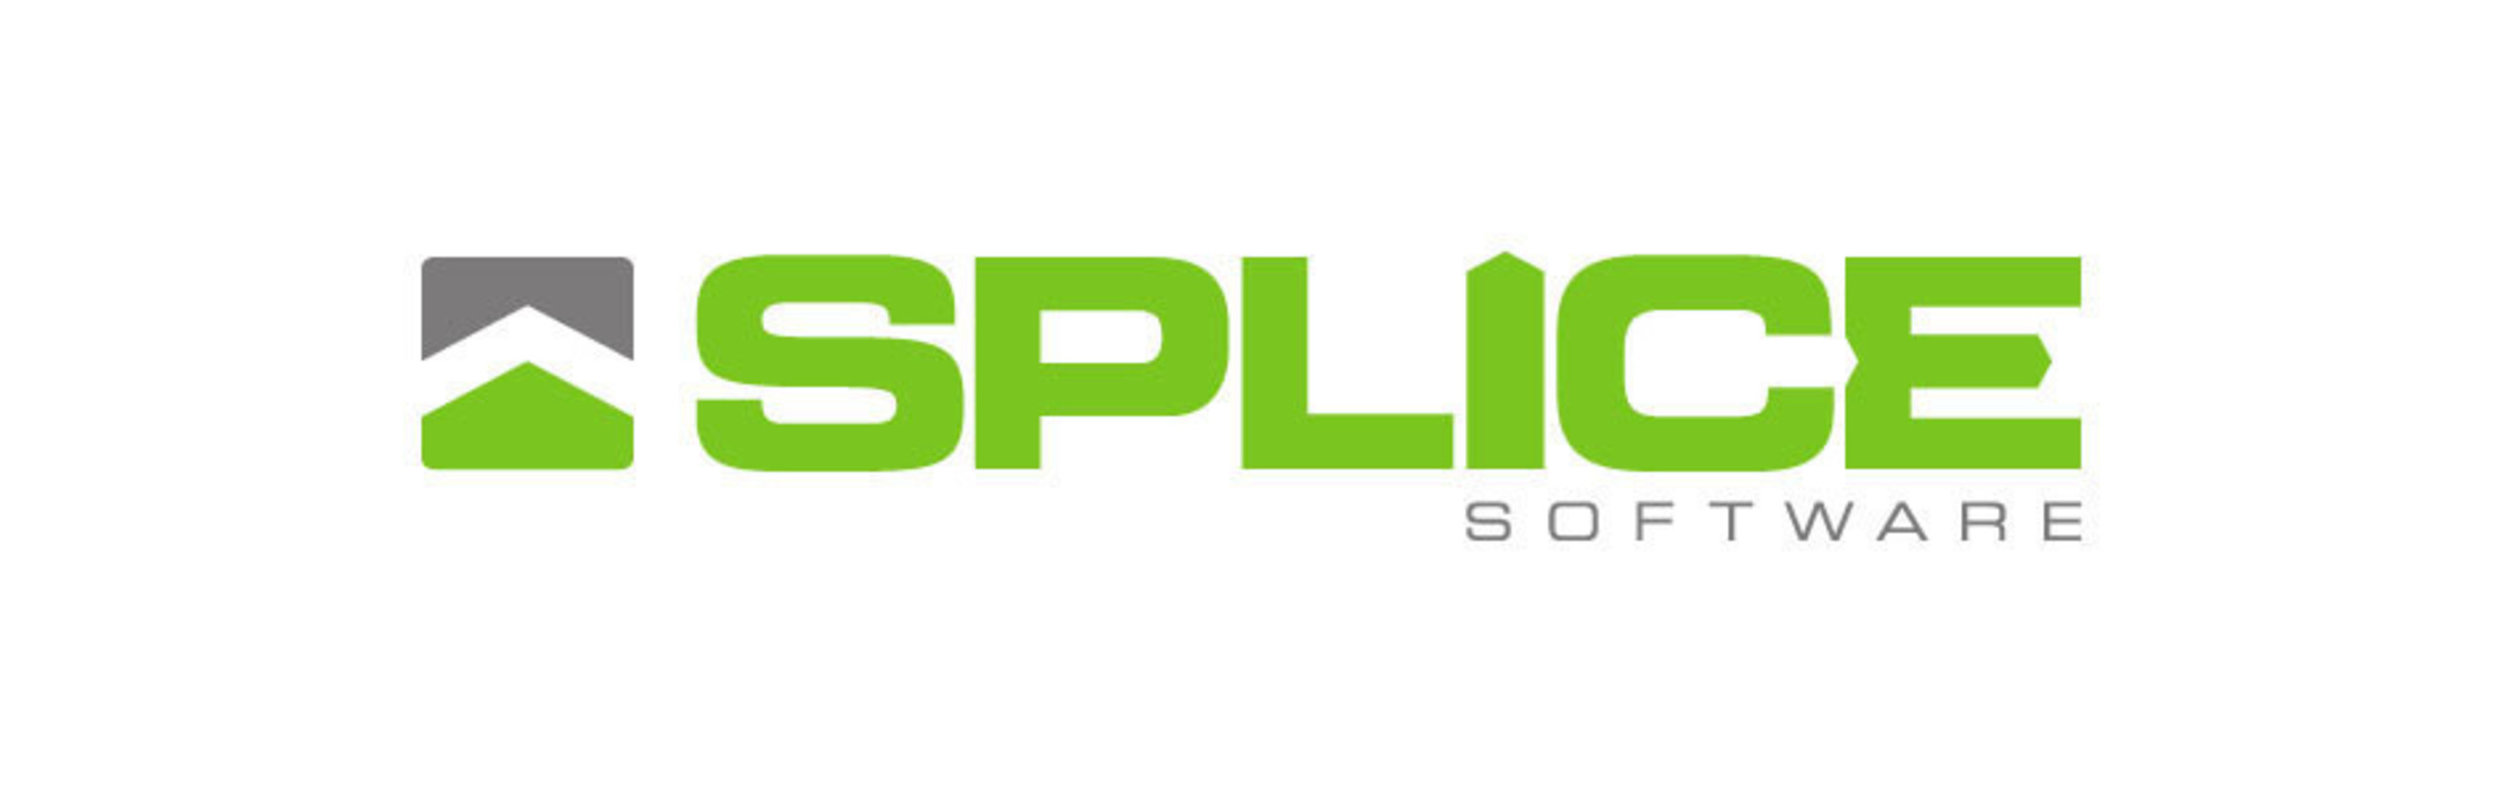 splice software logo.jpg